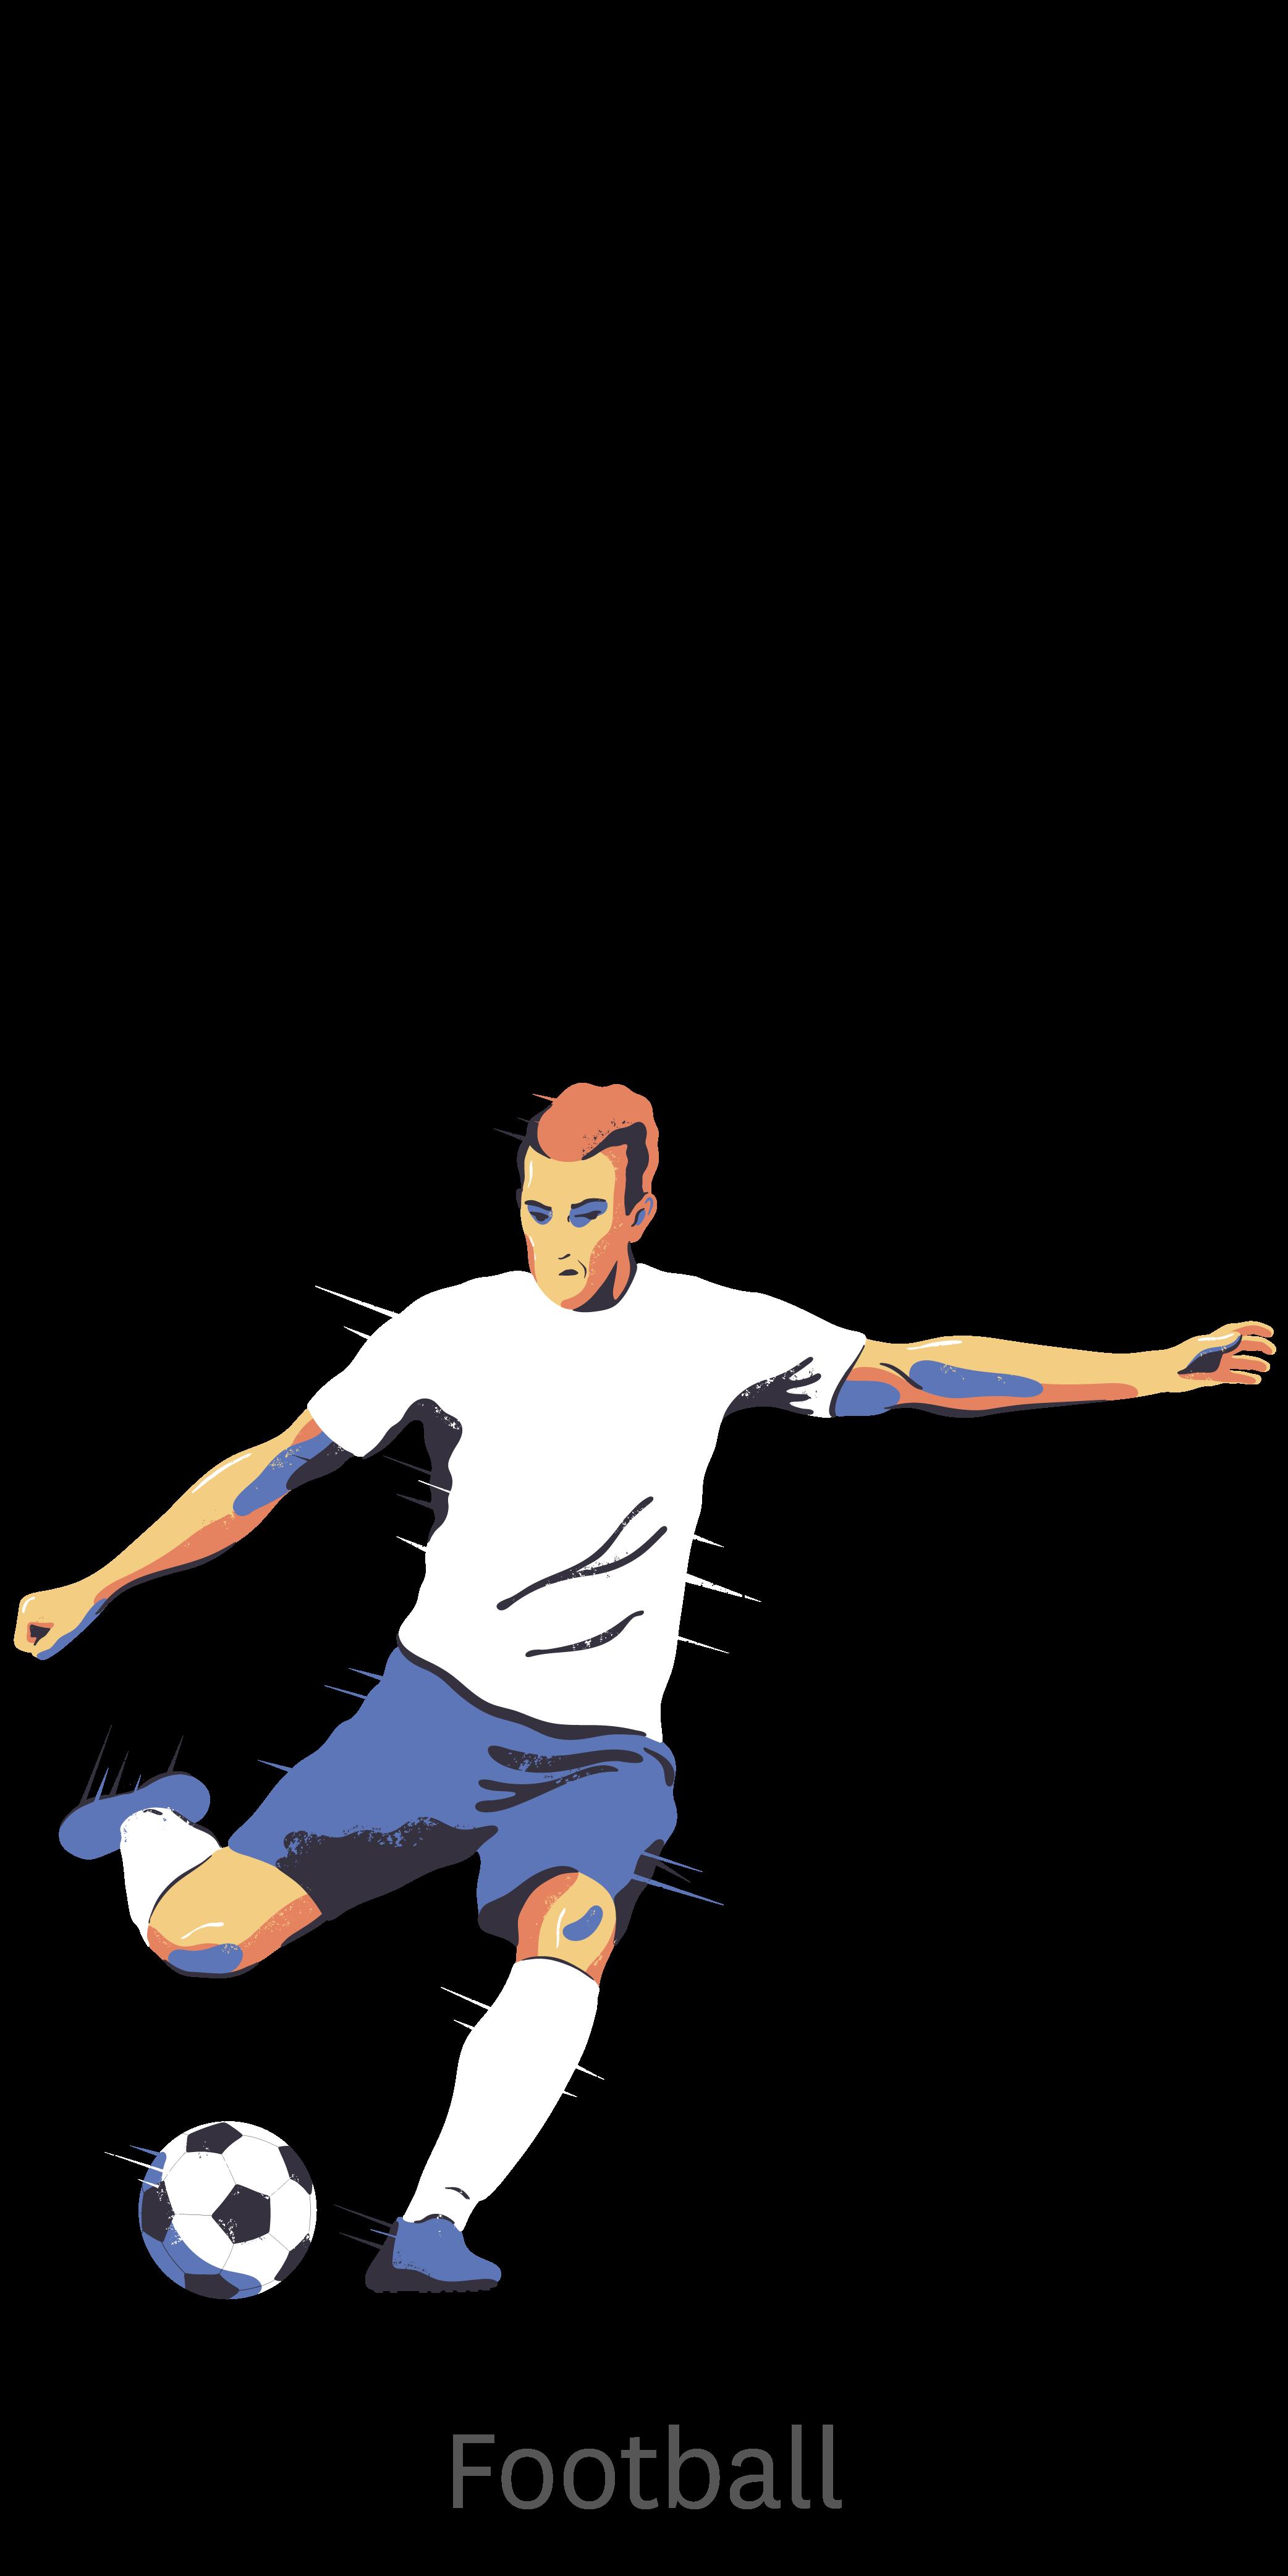 movement_sport_football.png